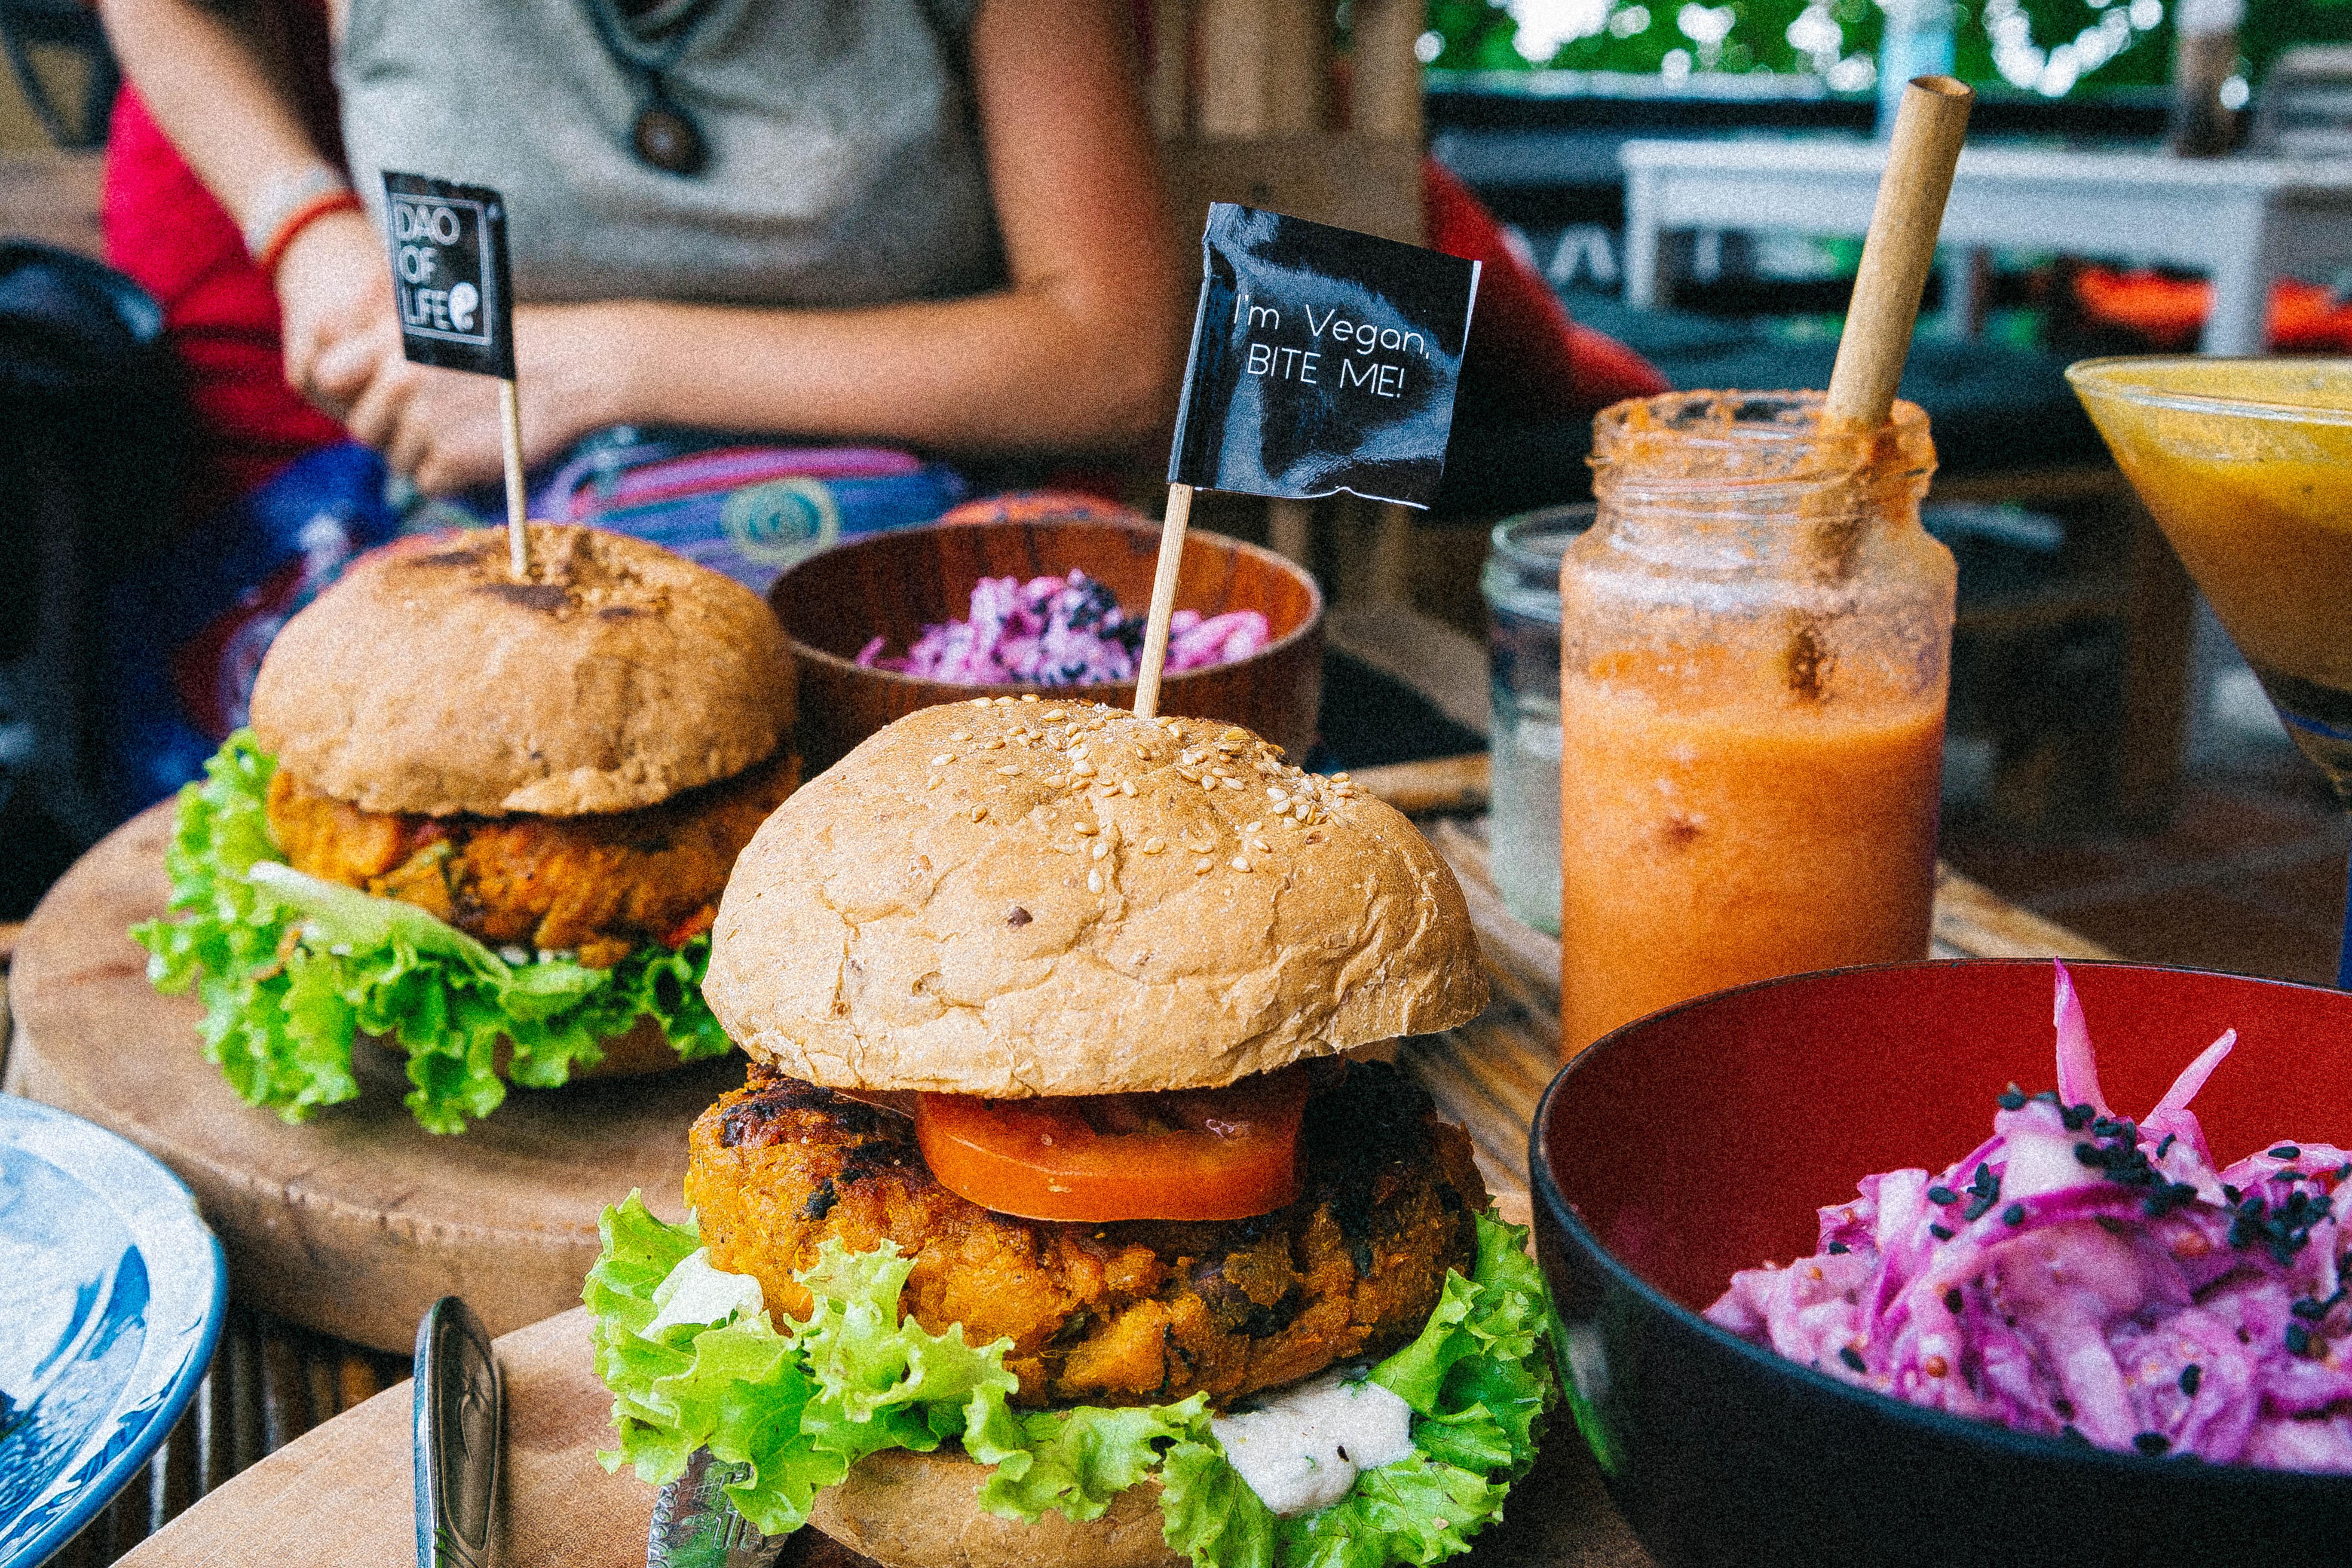 dao of life vegetarian vegan cafe in sihanoukville cambodia next to serendipity beach pier